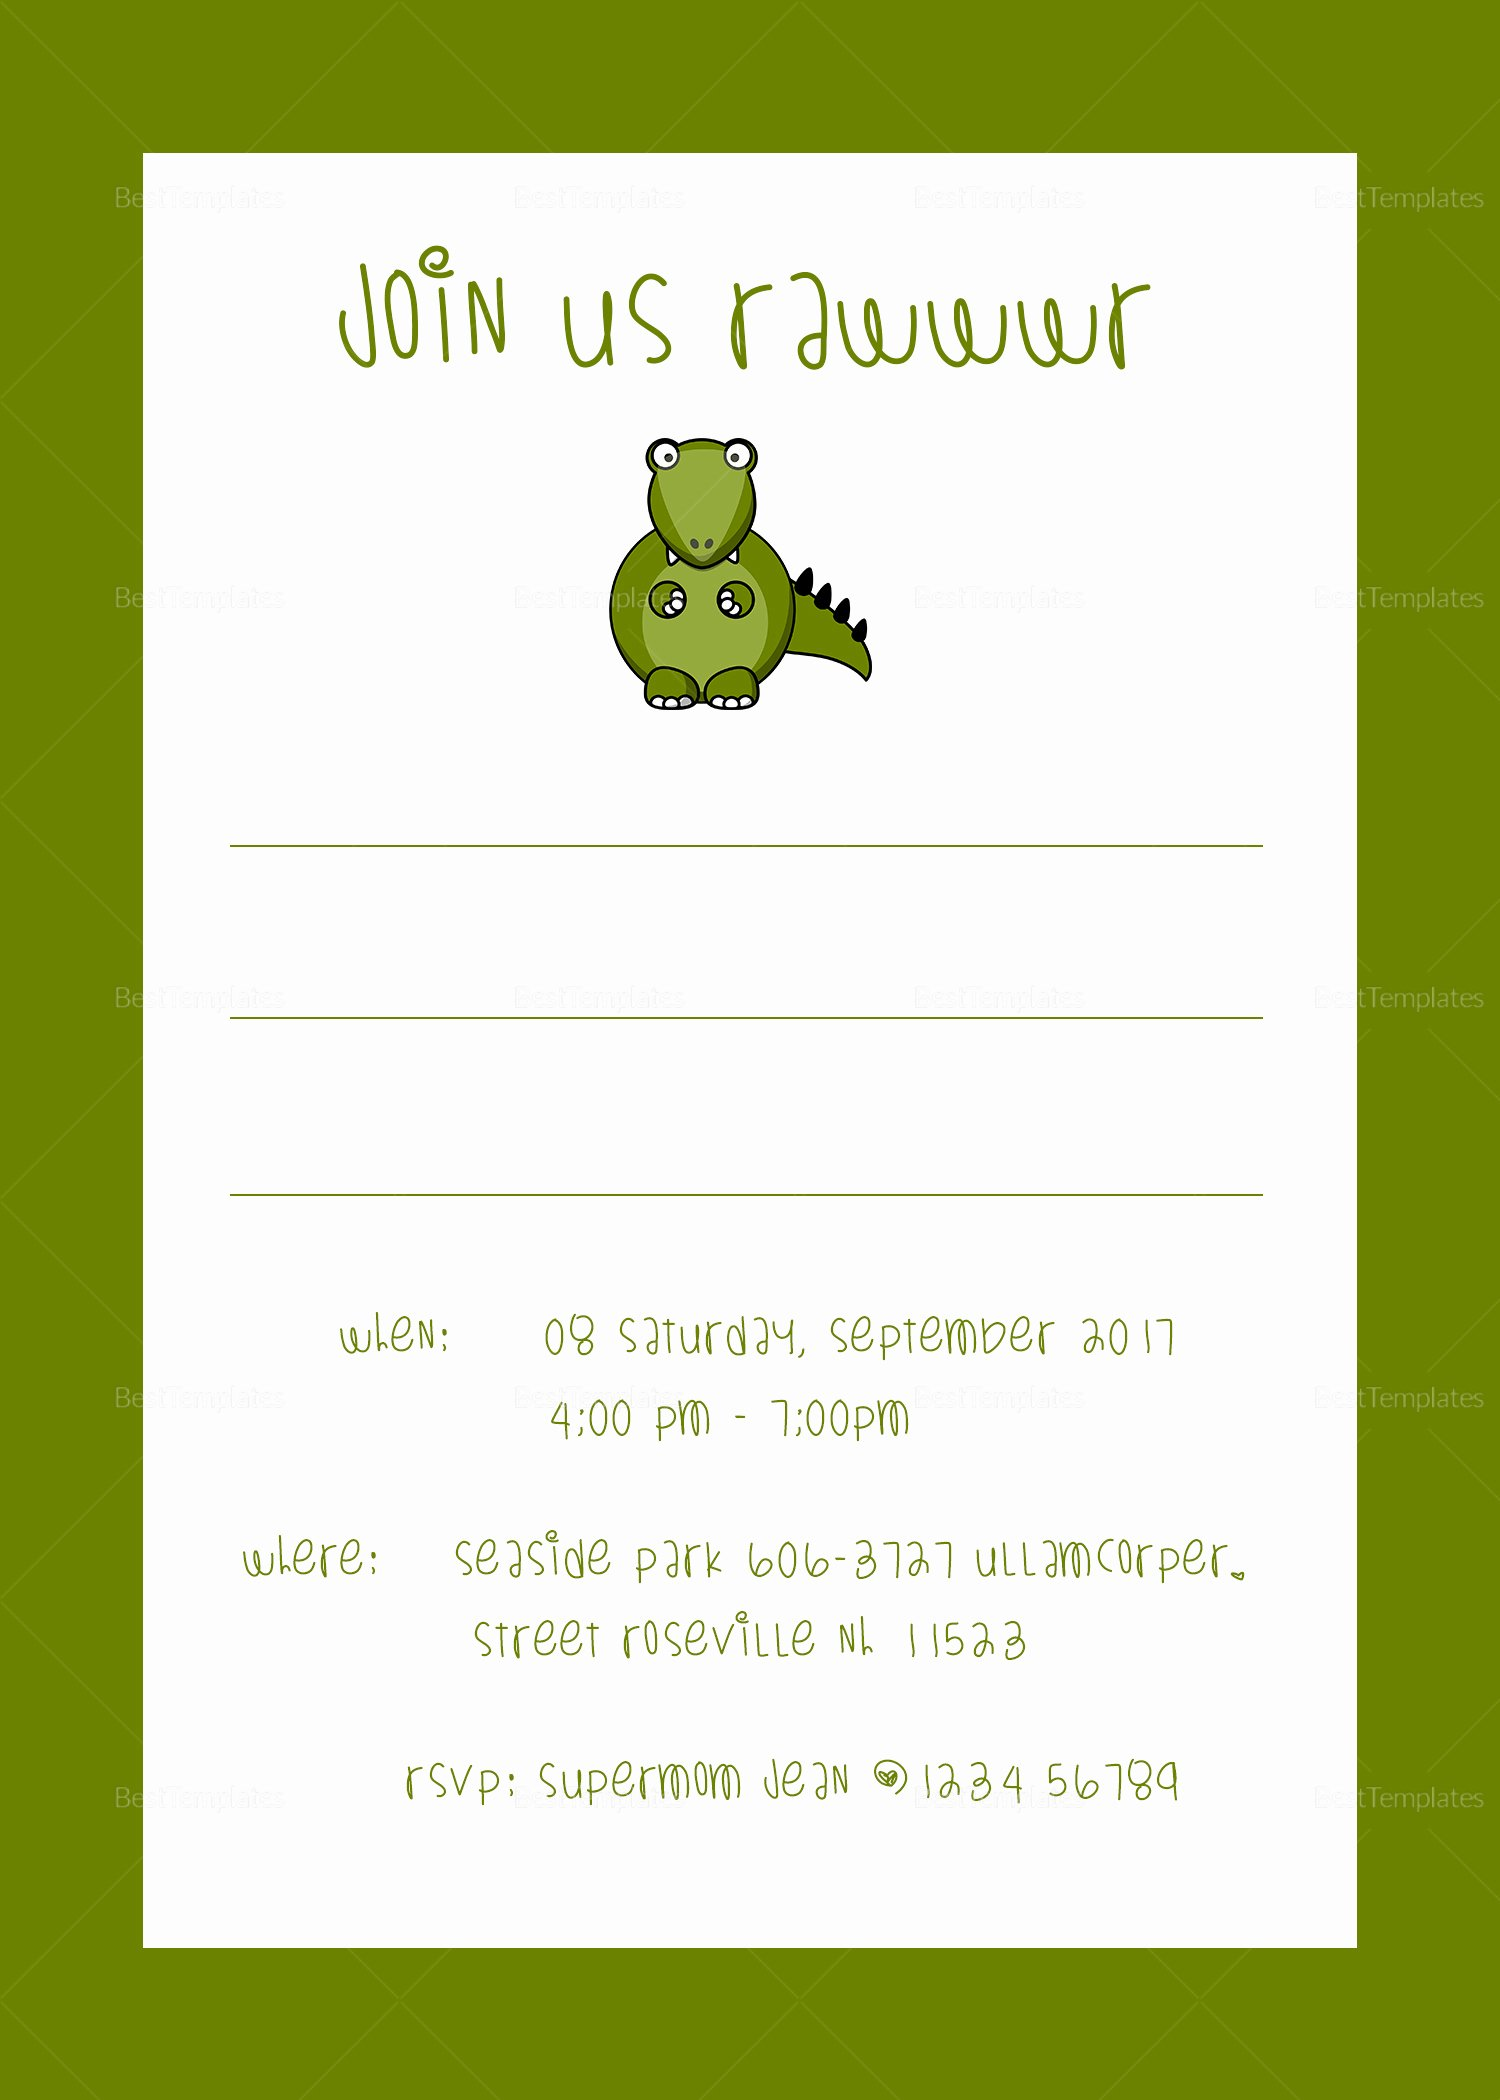 Dinosaur Birthday Invitation Template Fresh Dinosaur Birthday Party Invitation Design Template In Psd Word Publisher Illustrator Indesign